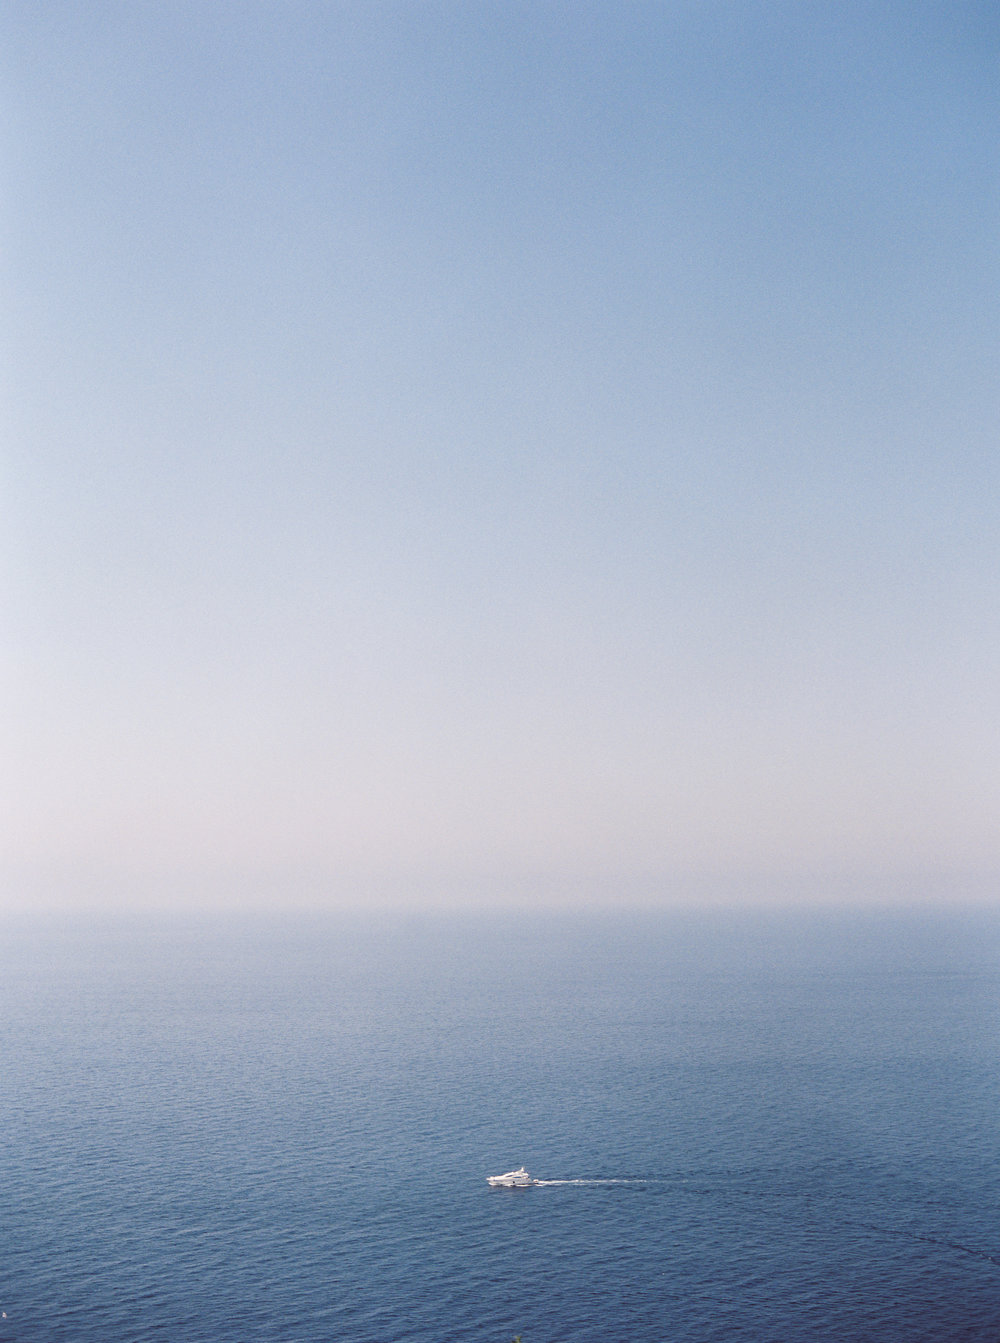 kristen_kilpatrick_pvtakeover_kristens_vision_contax645_fuji400h_sp3000_almalfi_coast_italy_mediterranean_photovisionprints.jpg